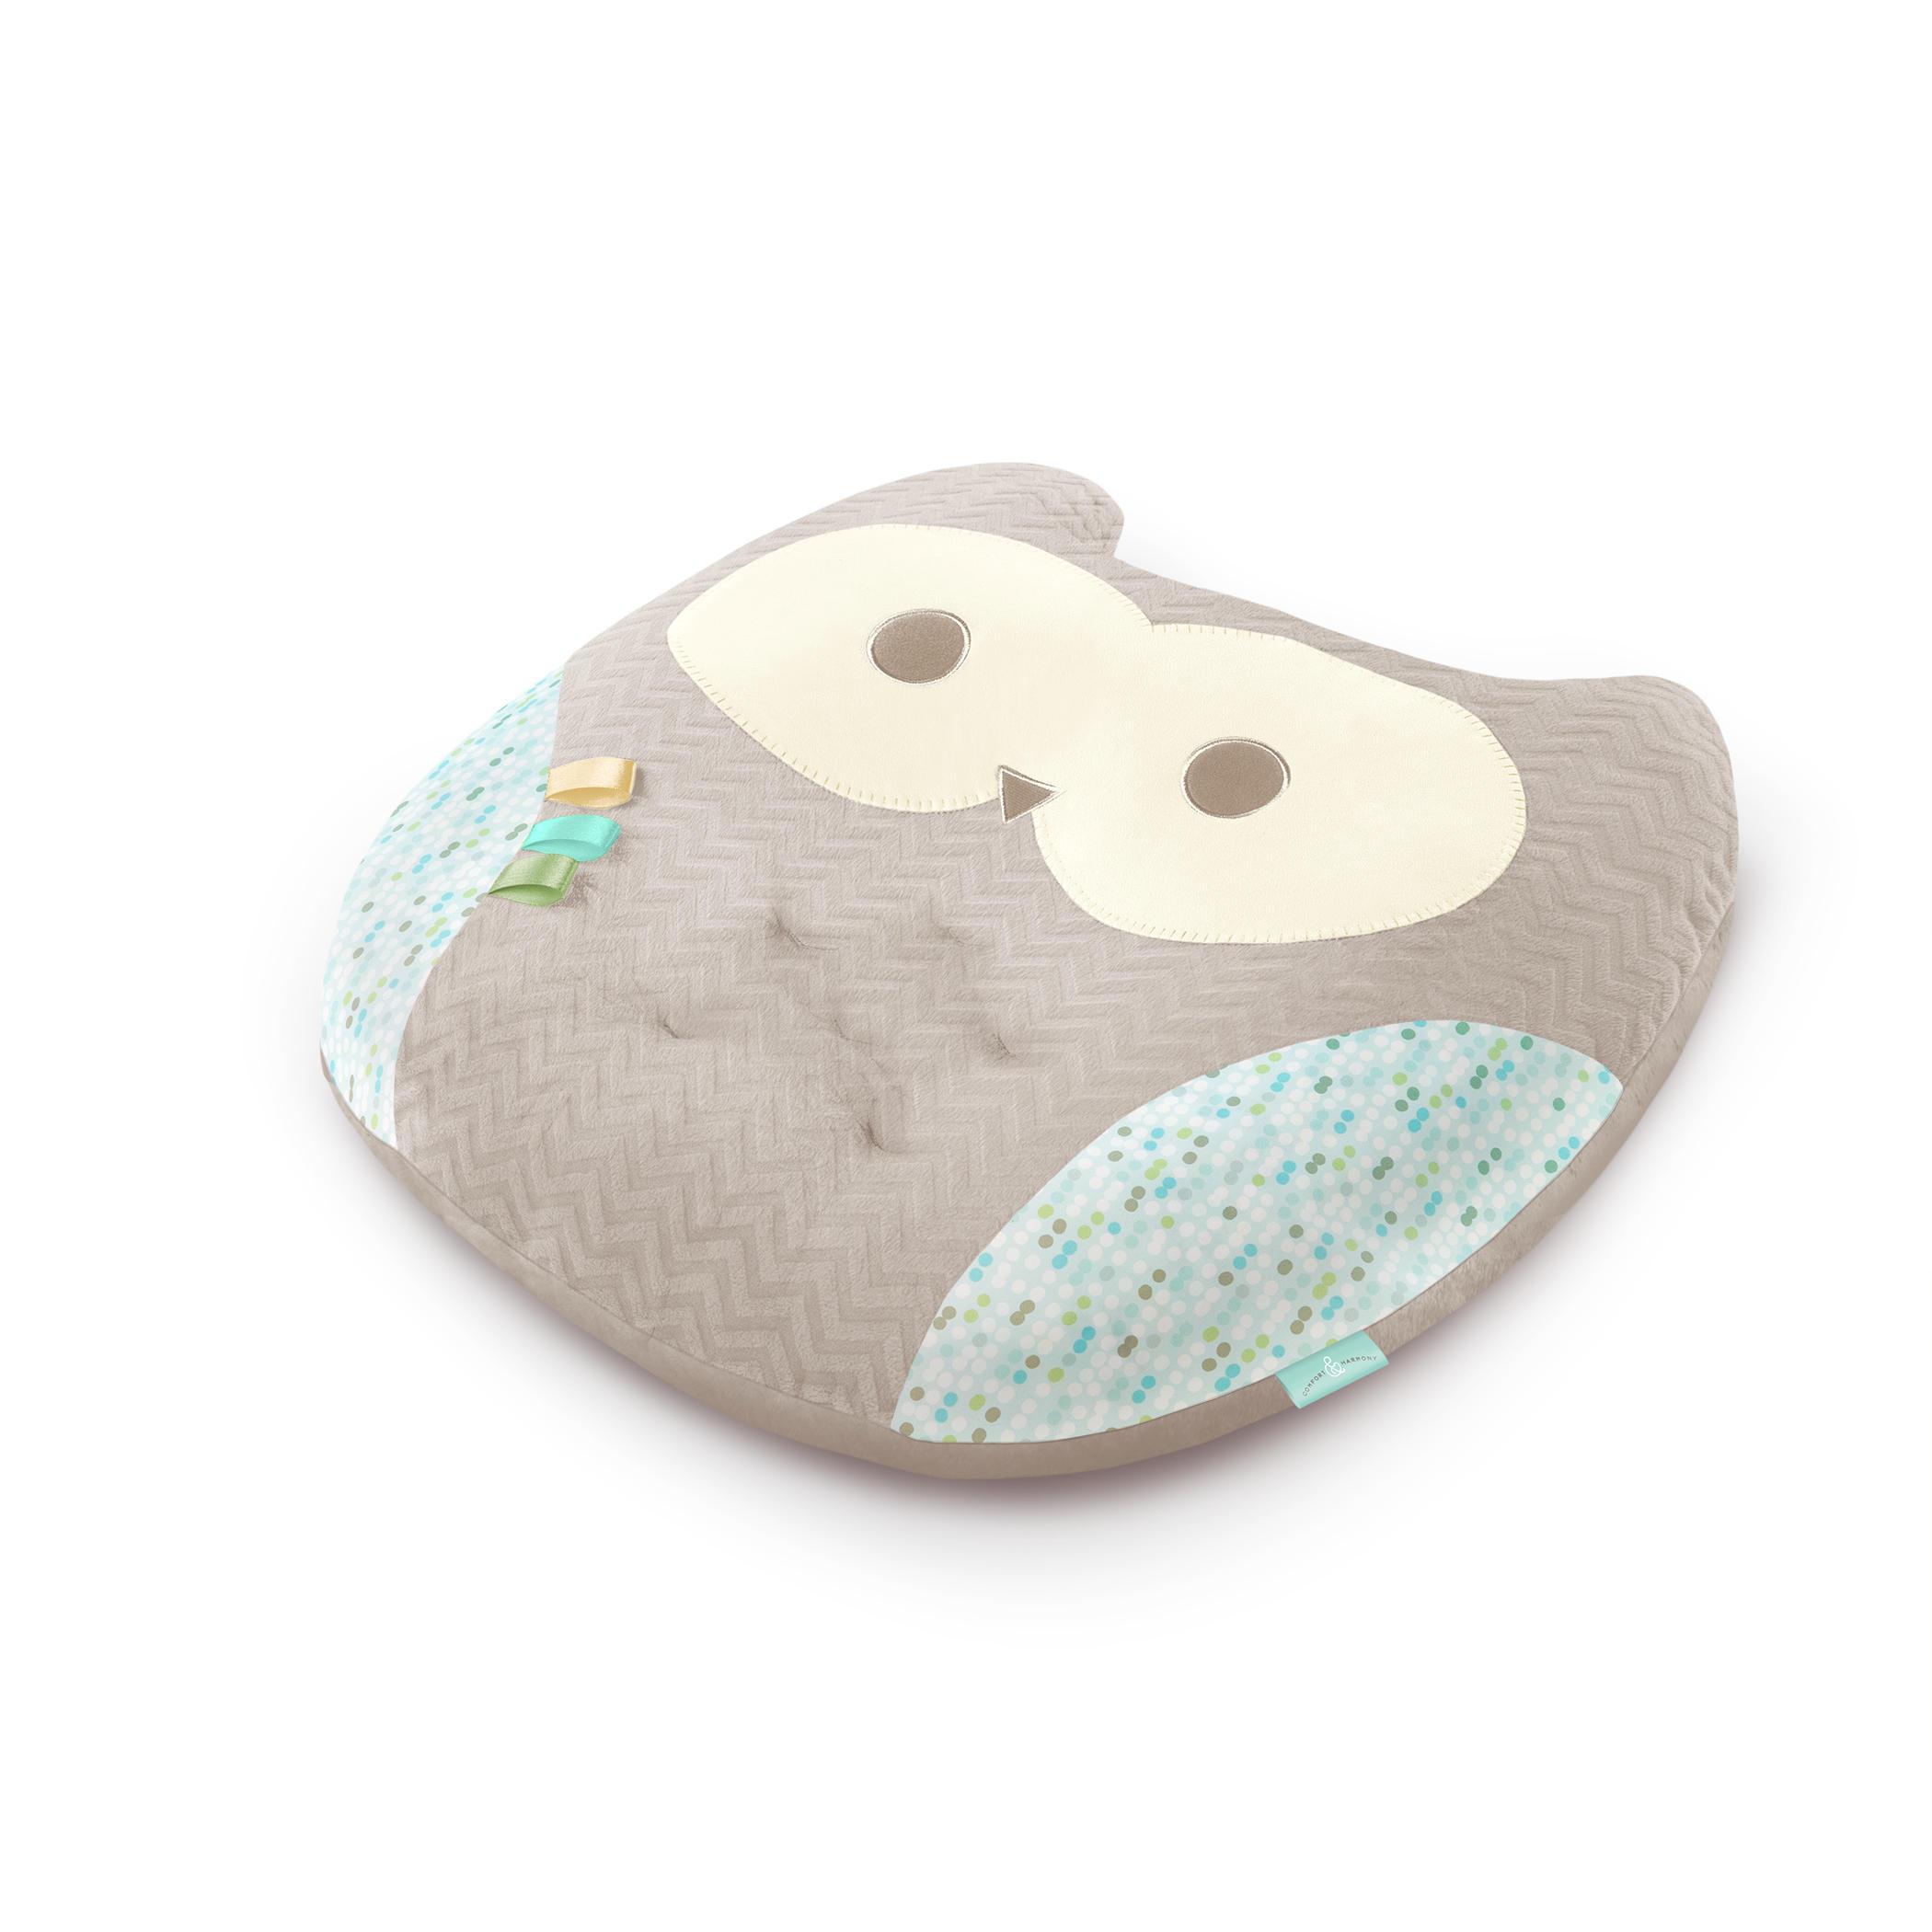 LoungeBuddies Infant Positioner™ - Owl